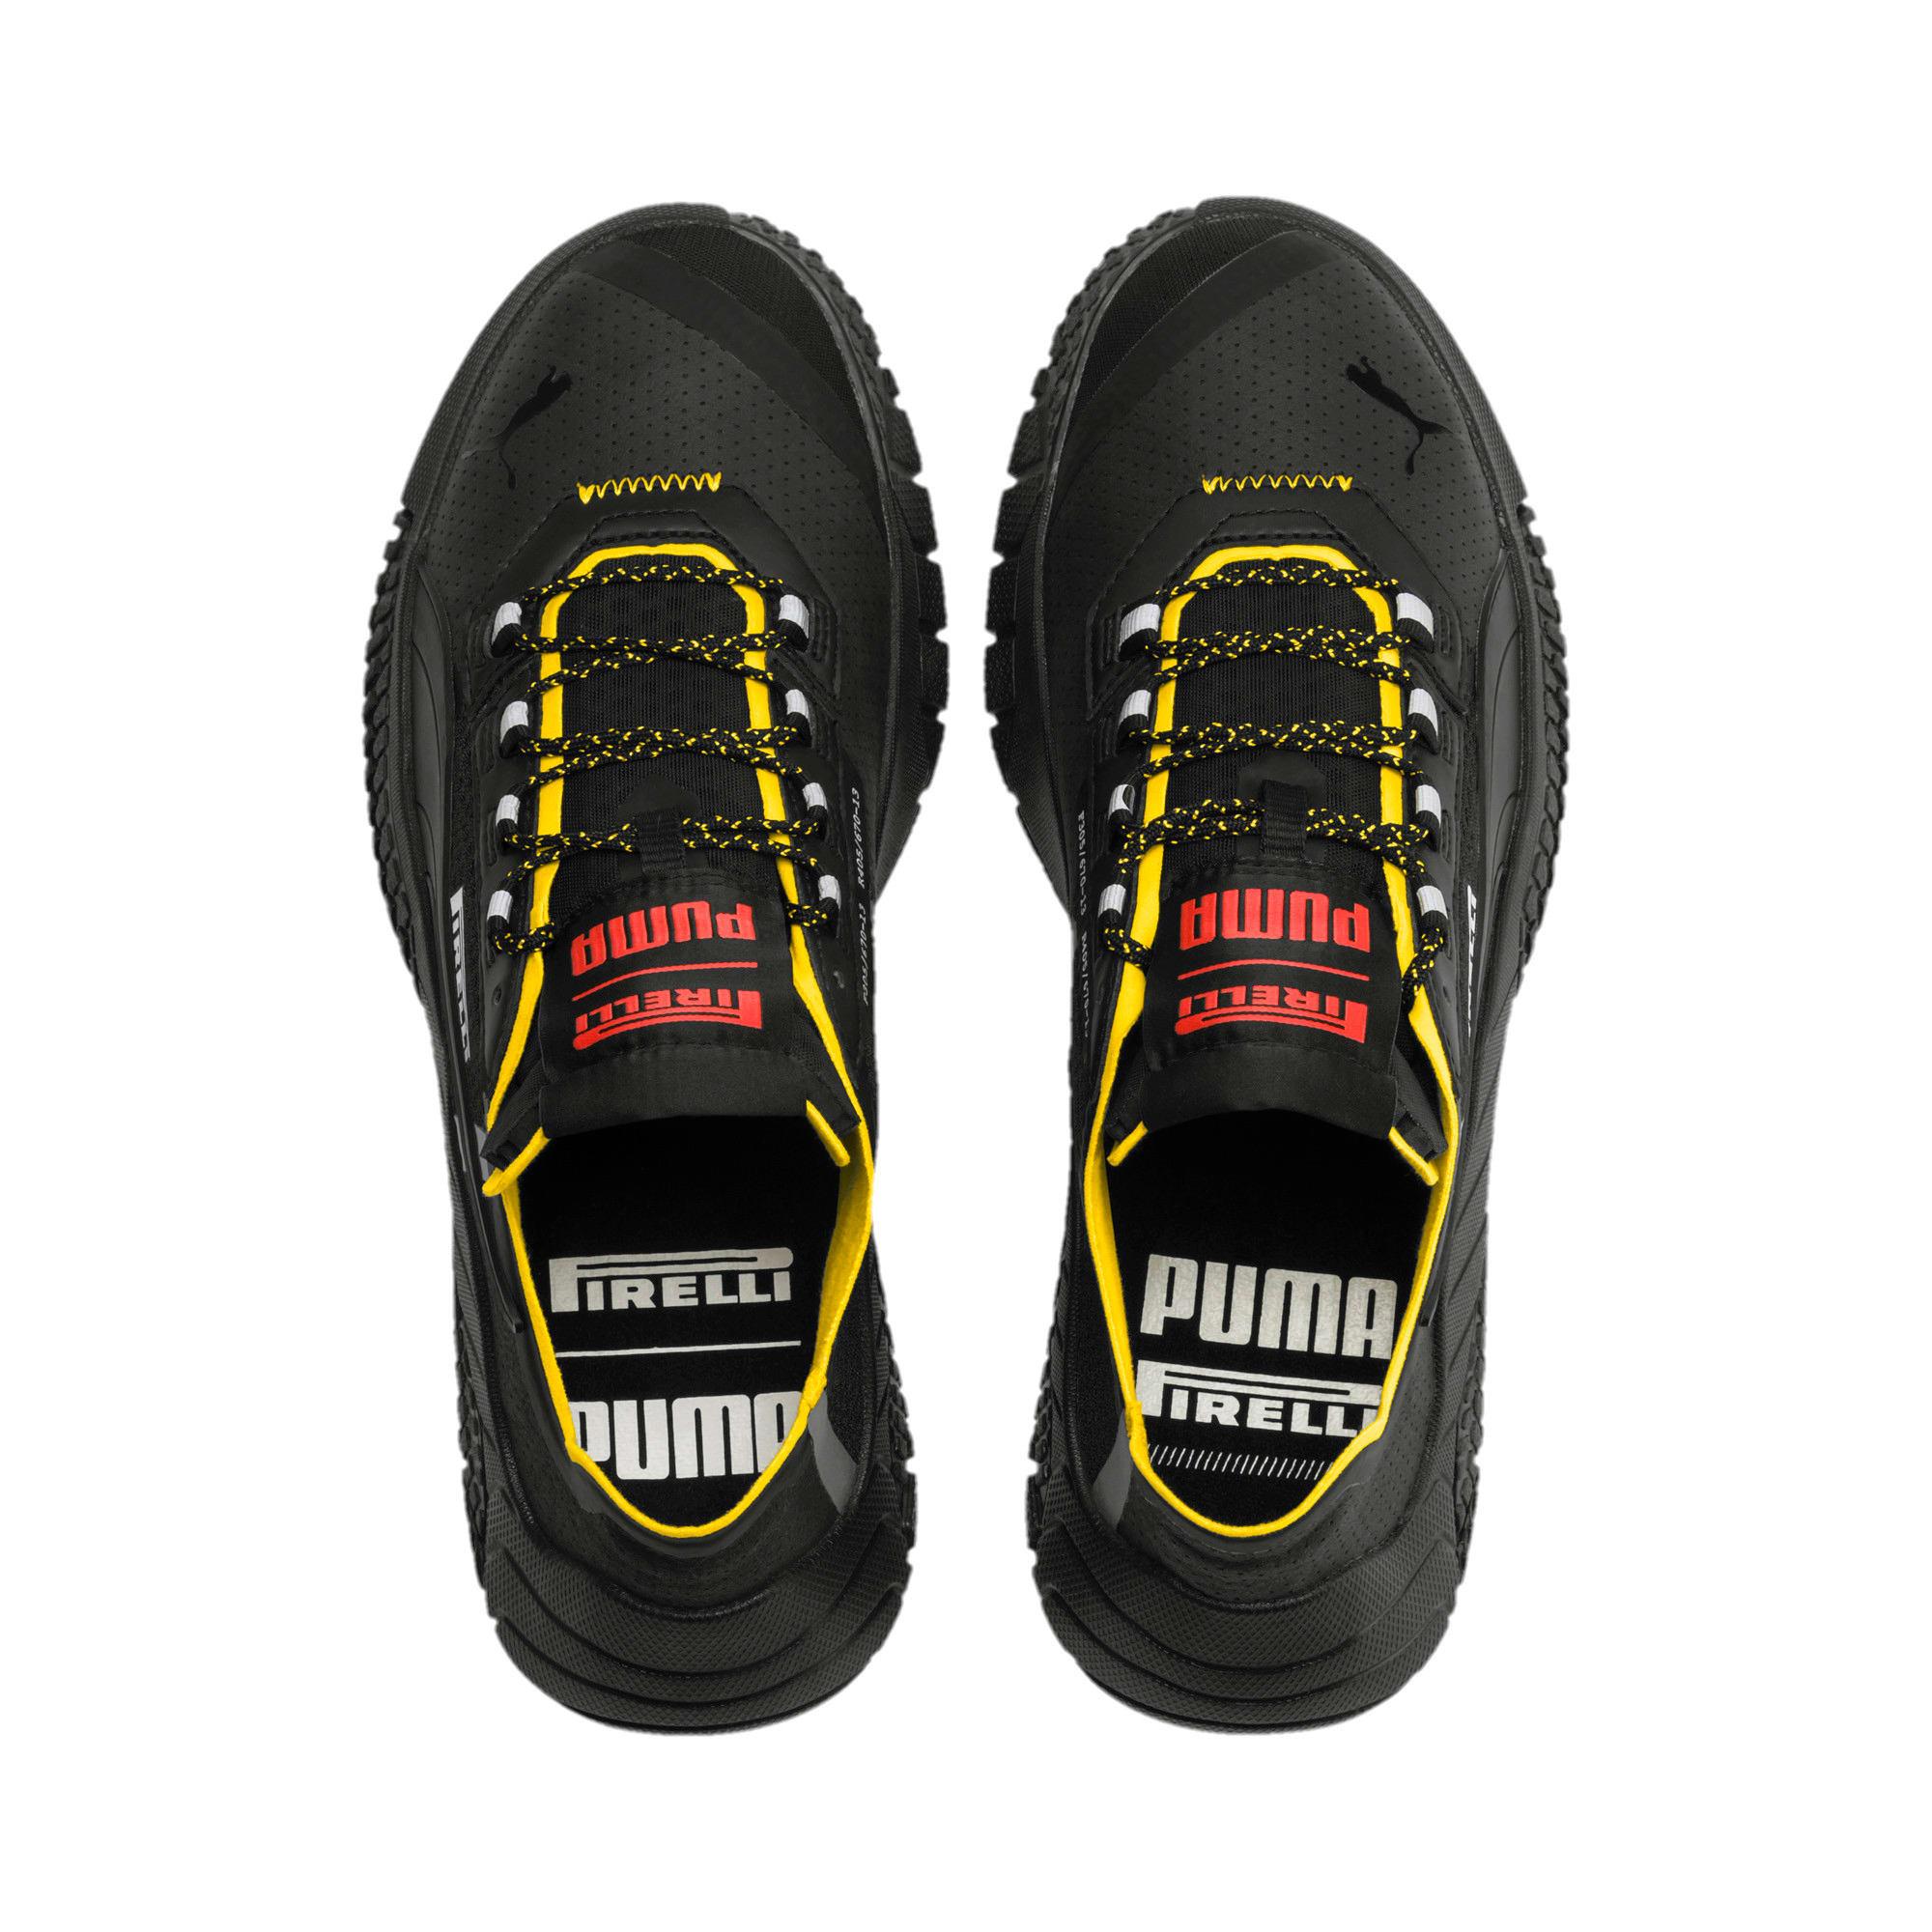 Thumbnail 6 of Replicat-X Pirelli Motorsport Shoes, Black-Black-Cyber Yellow, medium